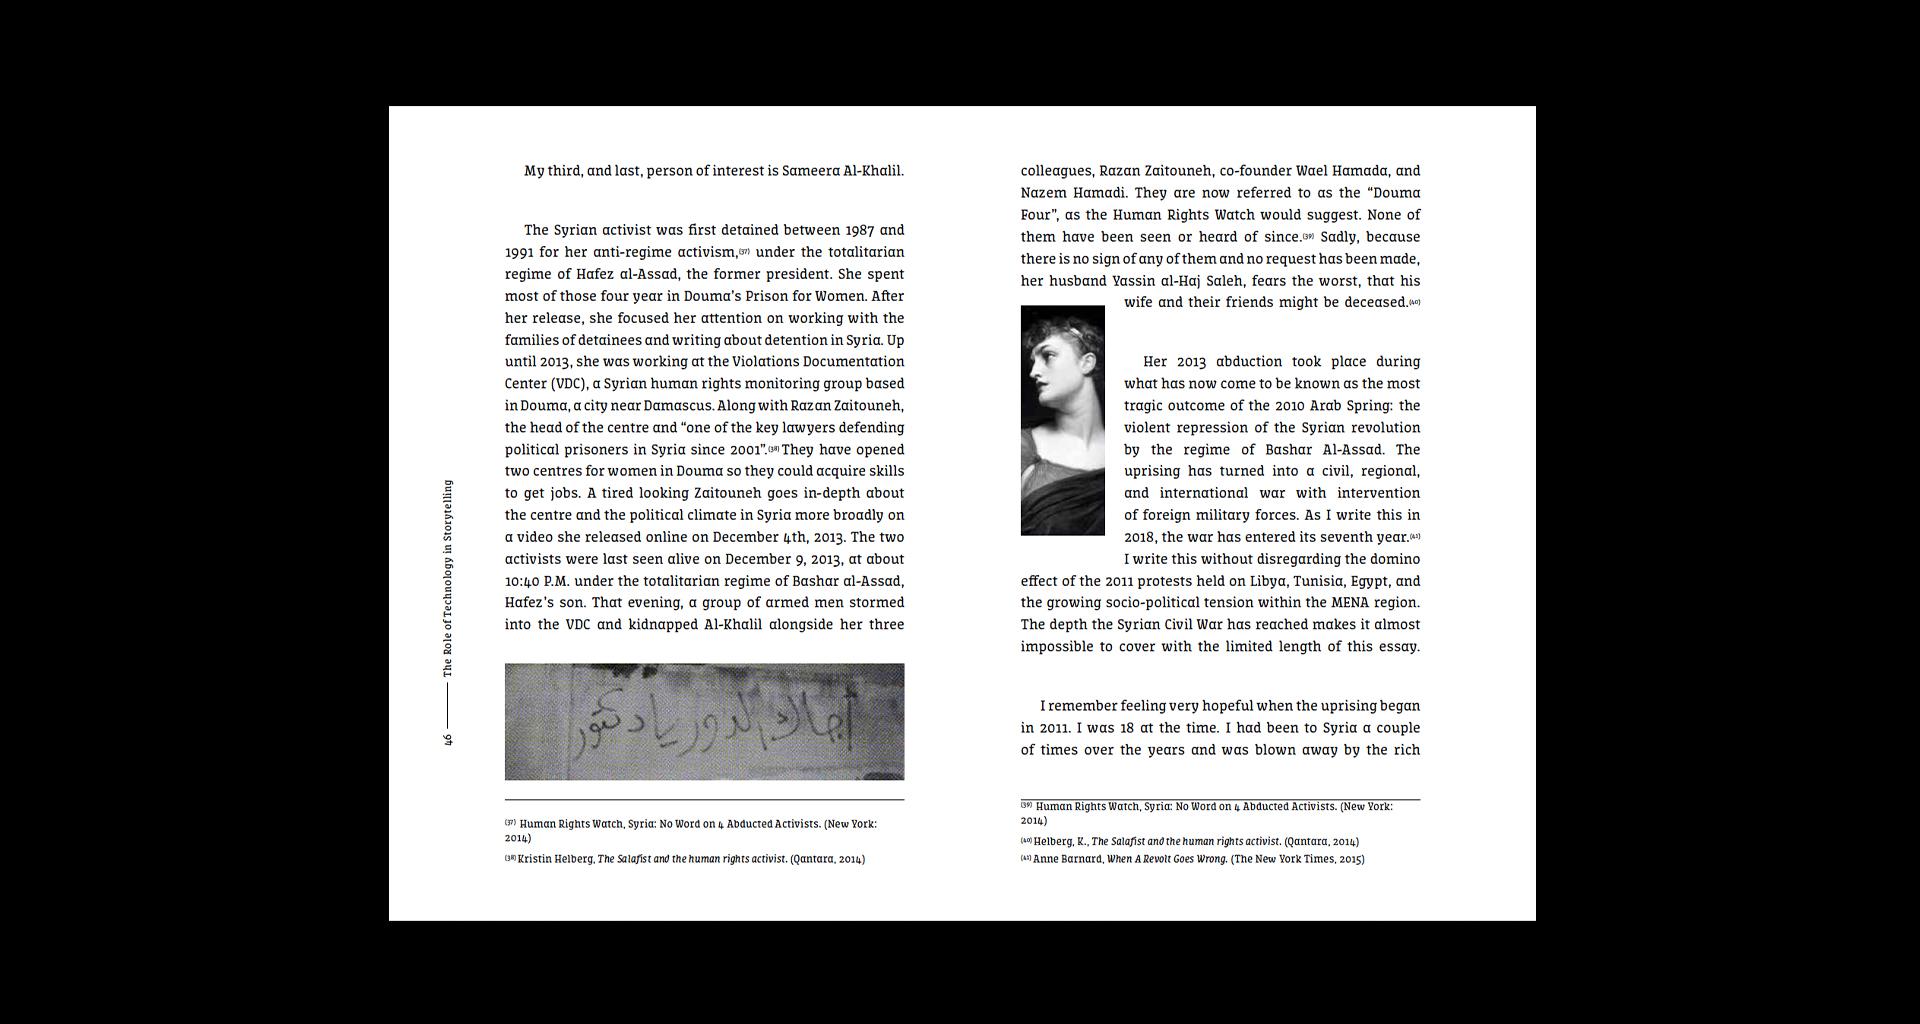 Dissertation_Photo_0002_Screenshot 2019-08-19 at 13.38.27.jpg